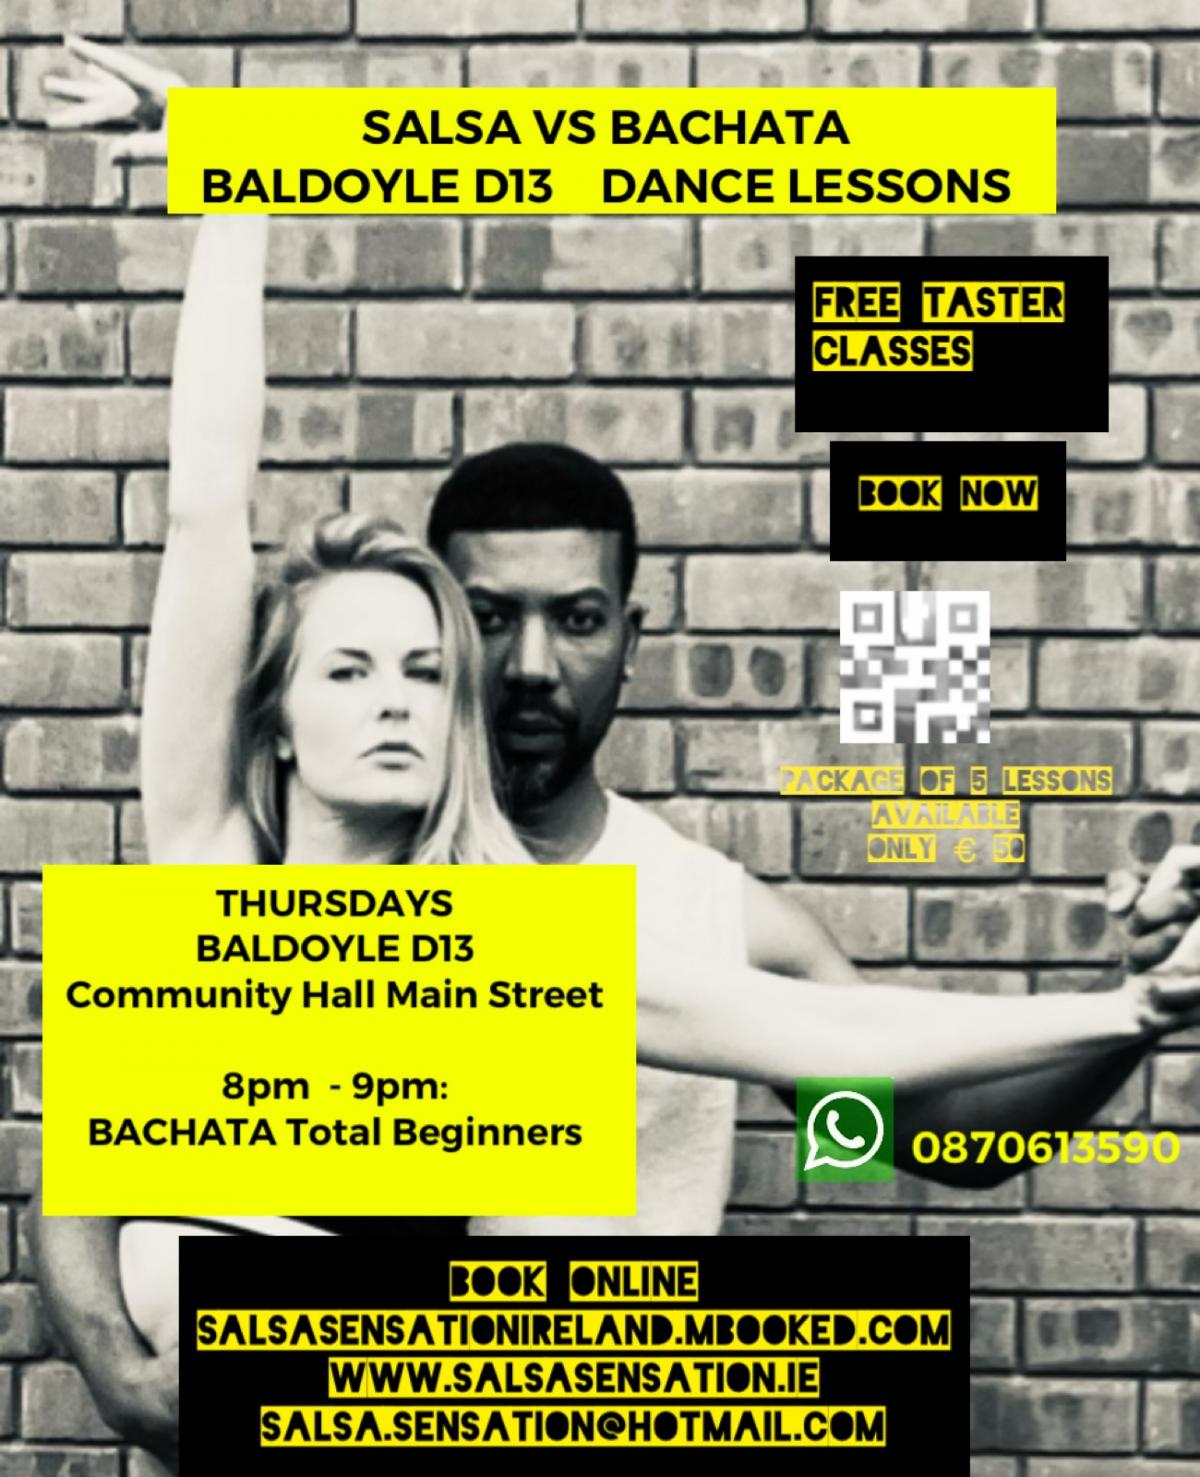 mBooked.com, Thursdays   Bachata Total Beginners   5 weeks Course   Baldoyle D13, Baldoyle Dublin 13, Salsa Sensation Ireland